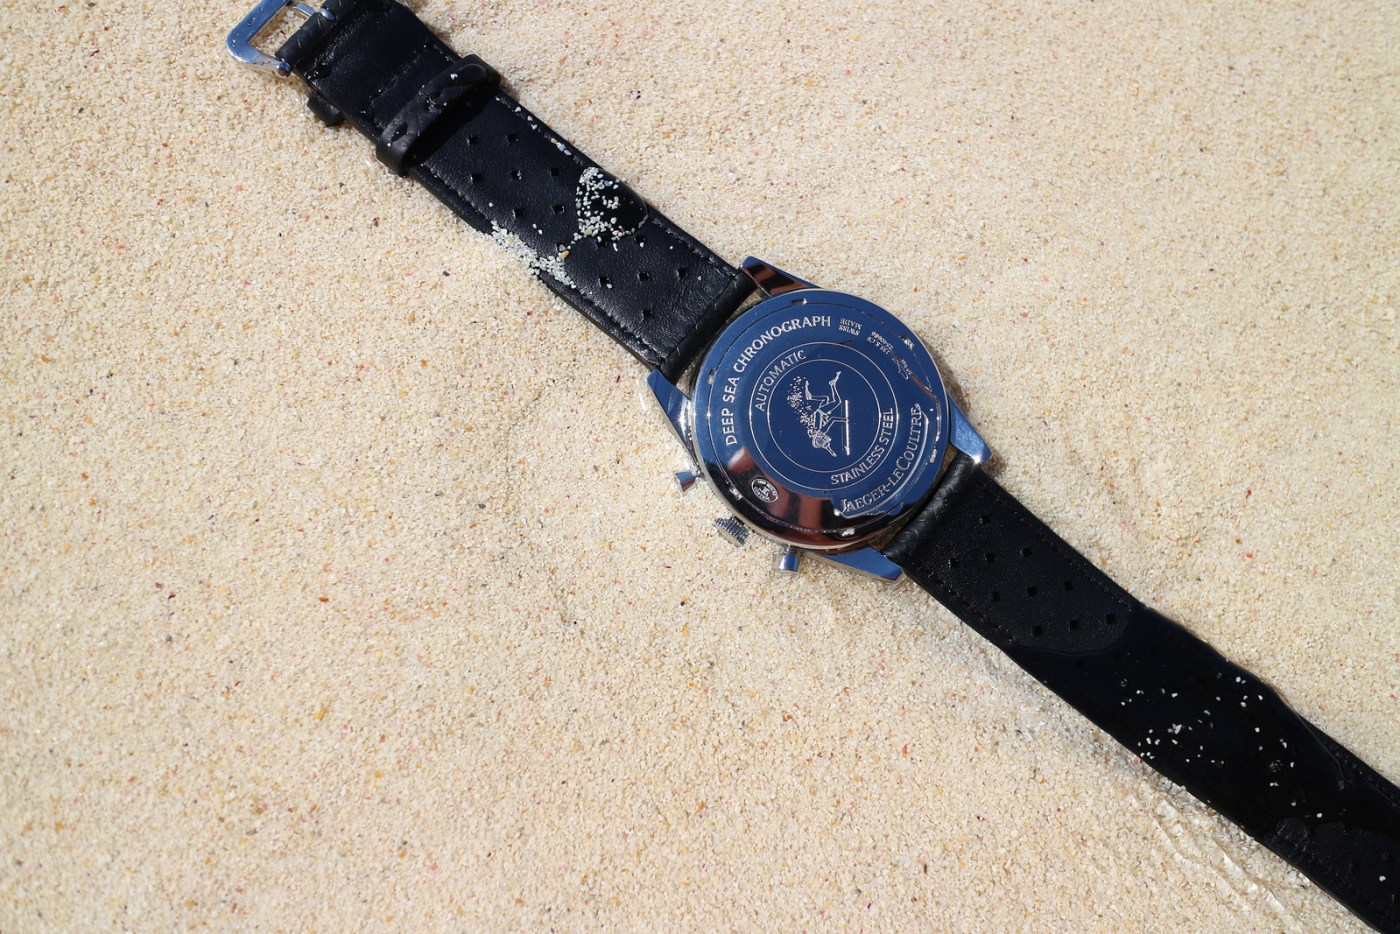 Jaeger-LeCoultre Deep Sea Chronograph caseback